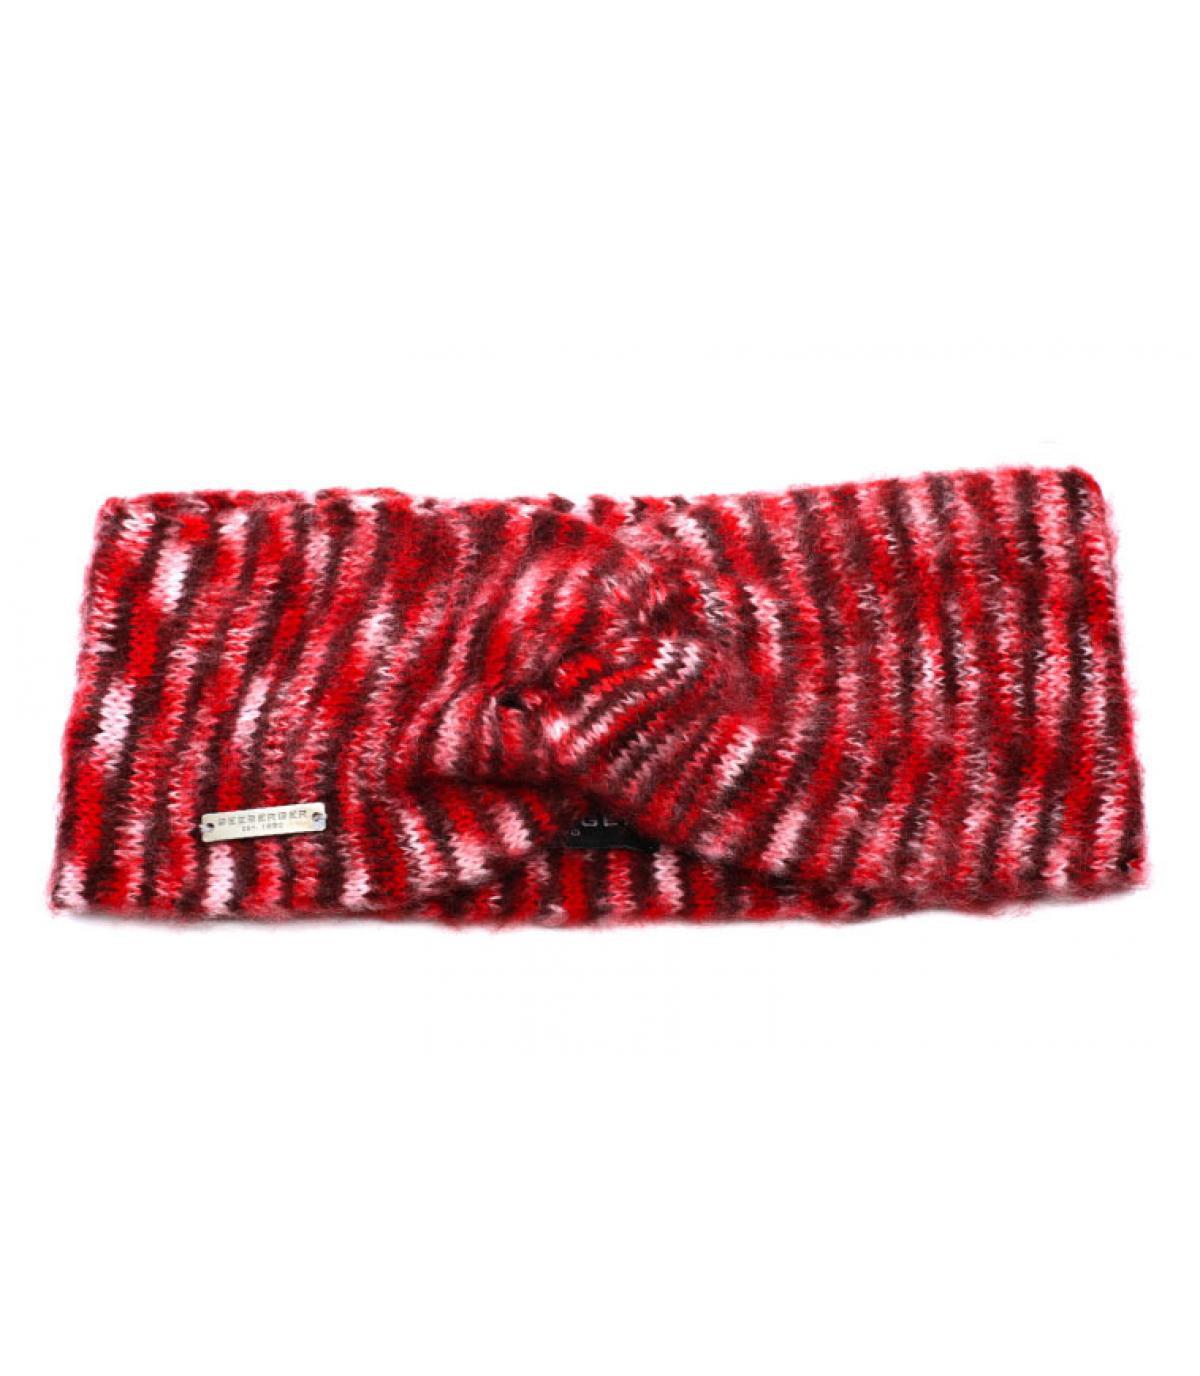 Seeberger burgundy headband